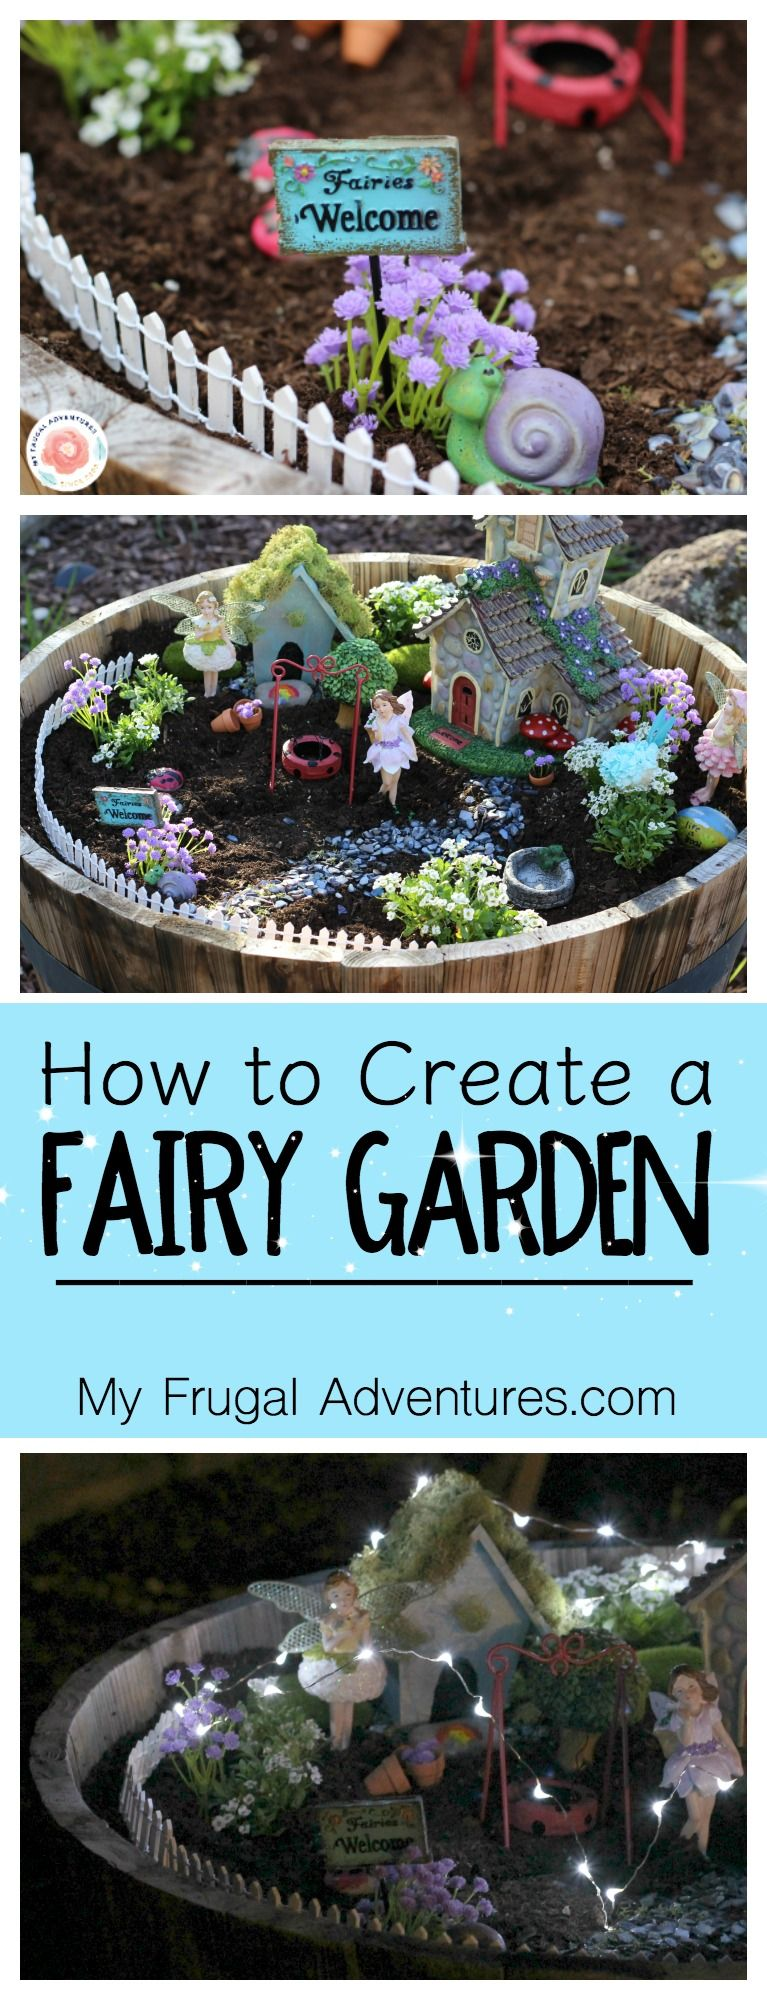 How to Make a Fairy Garden {for Indoor or Outdoor | Children's